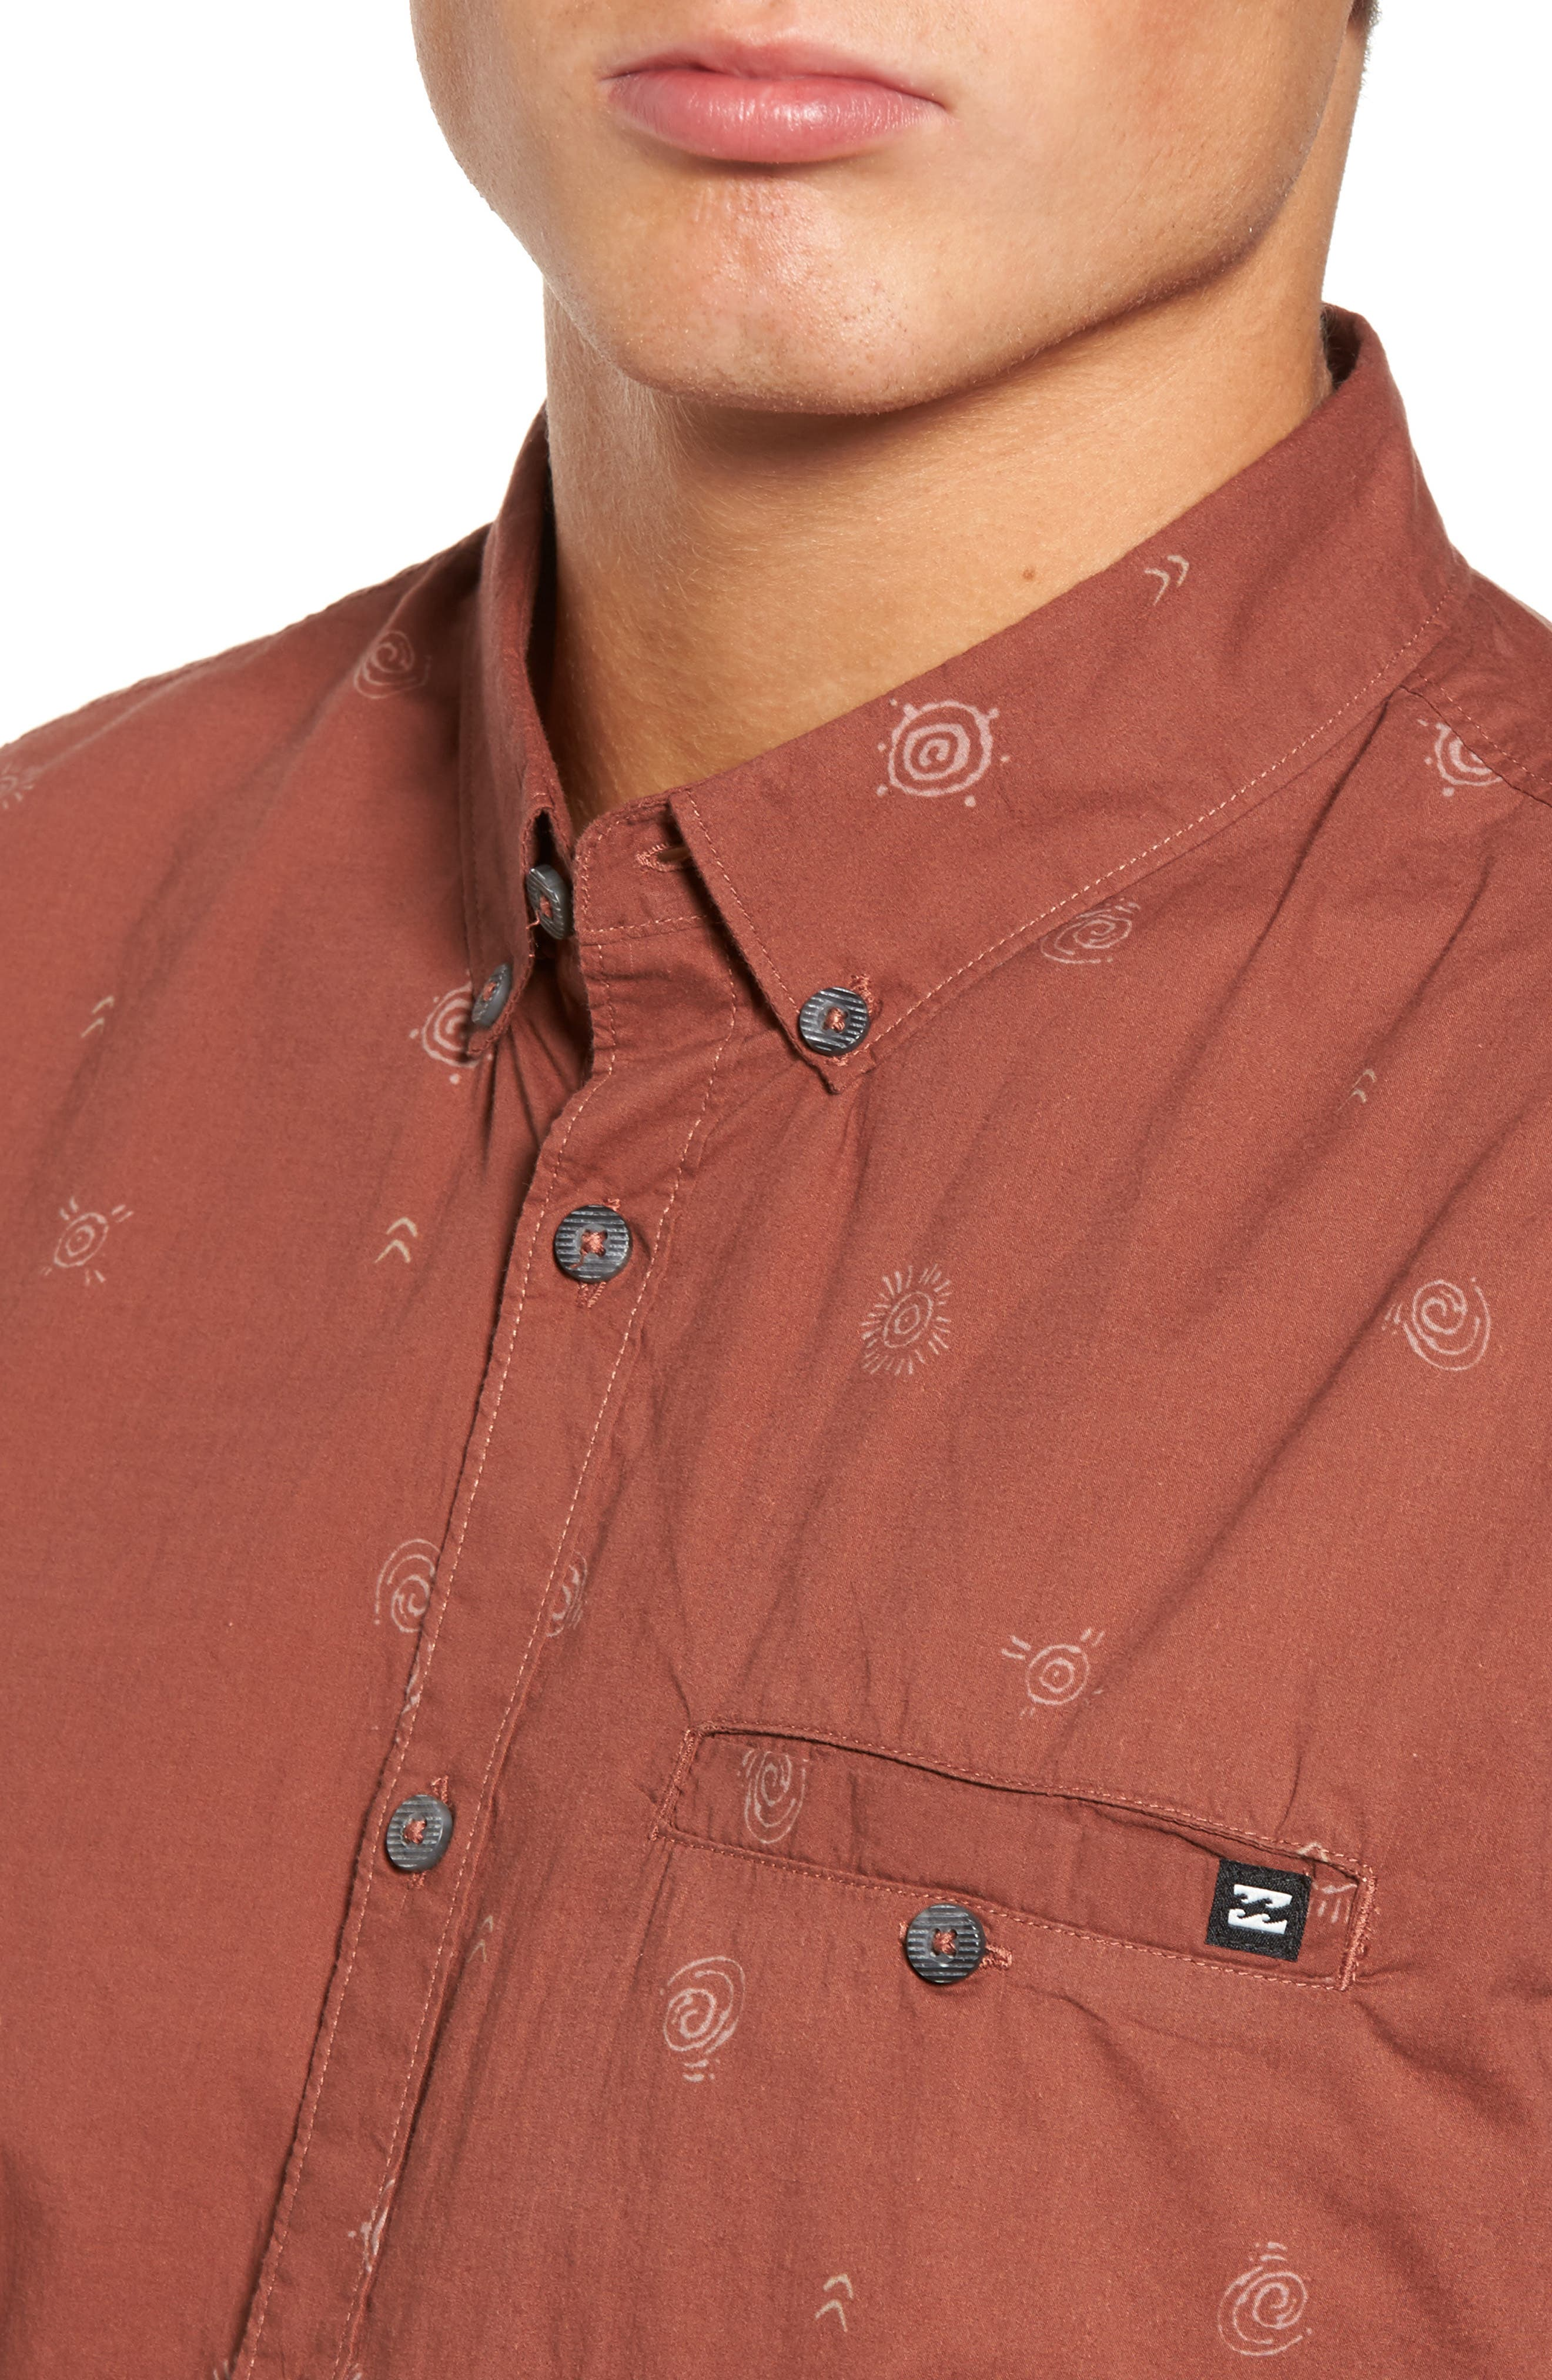 Sunday Woven Shirt,                             Alternate thumbnail 15, color,